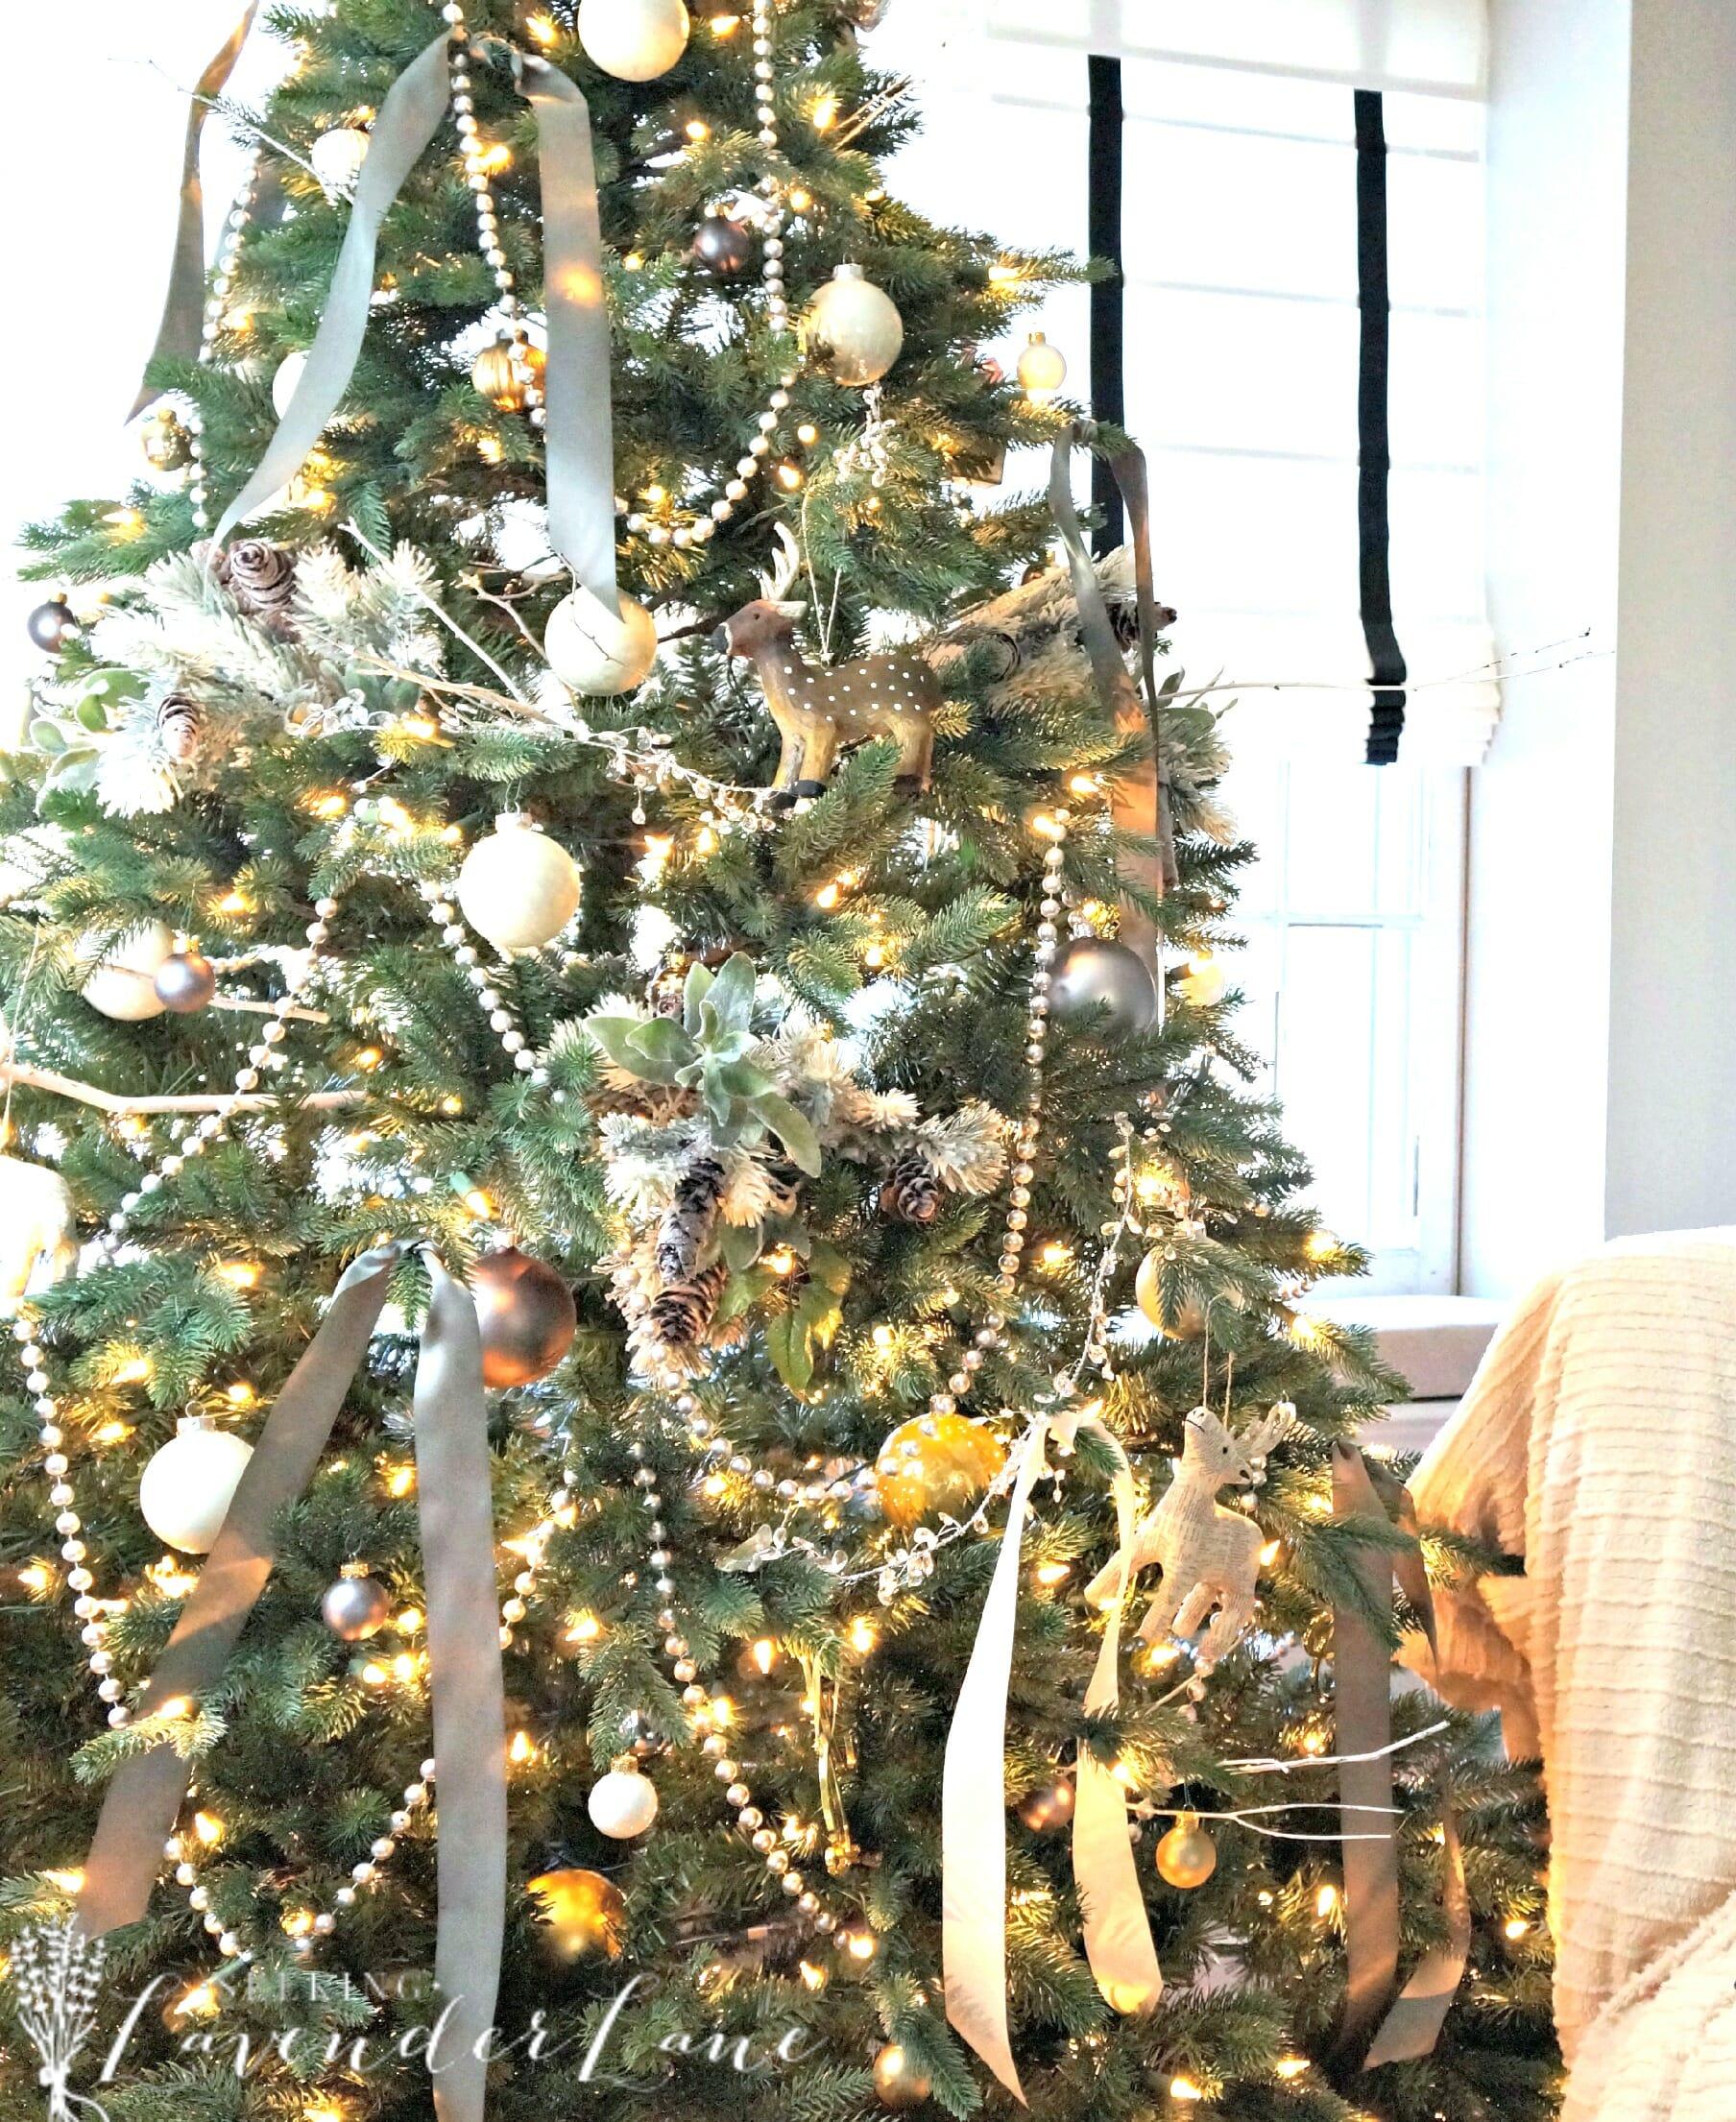 Where To Buy Balsam Hill Christmas Trees: Rustic Sweetness Christmas Tree